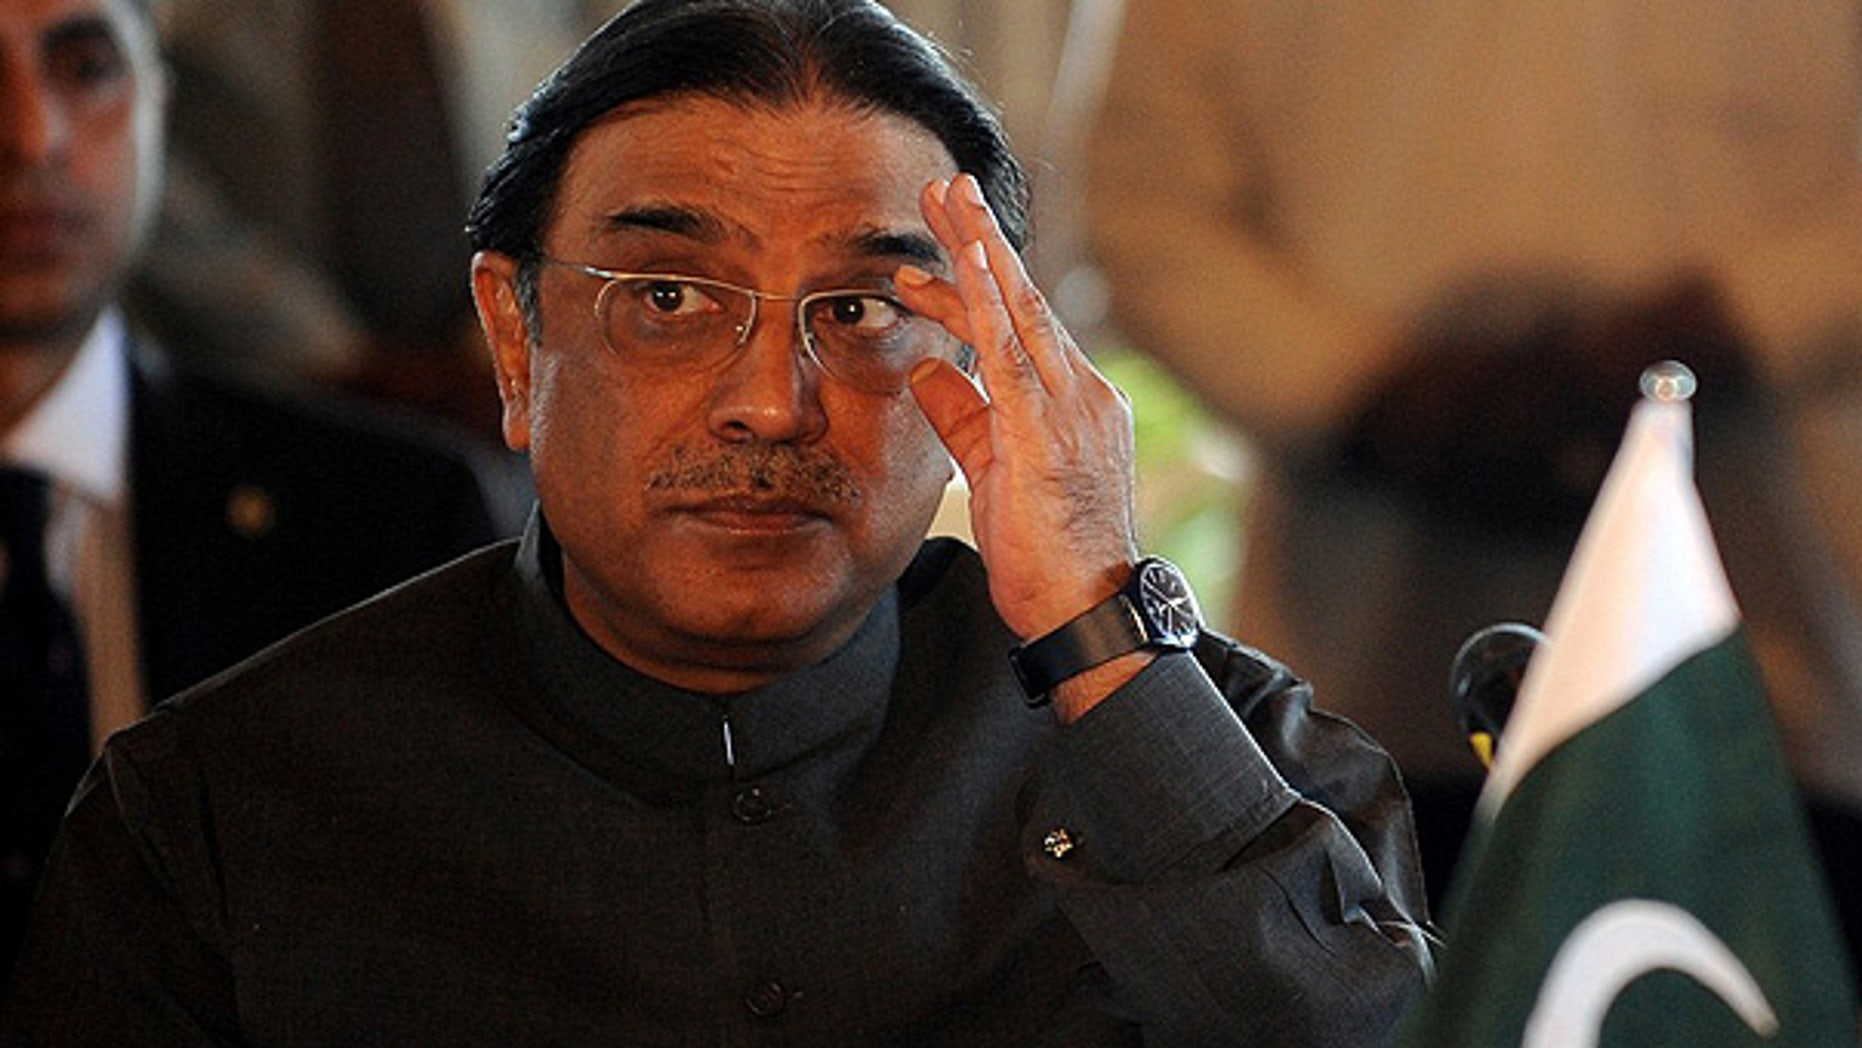 Nov. 29: Pakistan's President Asif Ali Zardari visits Sri Lanka in a bid to boost trade and security cooperation.